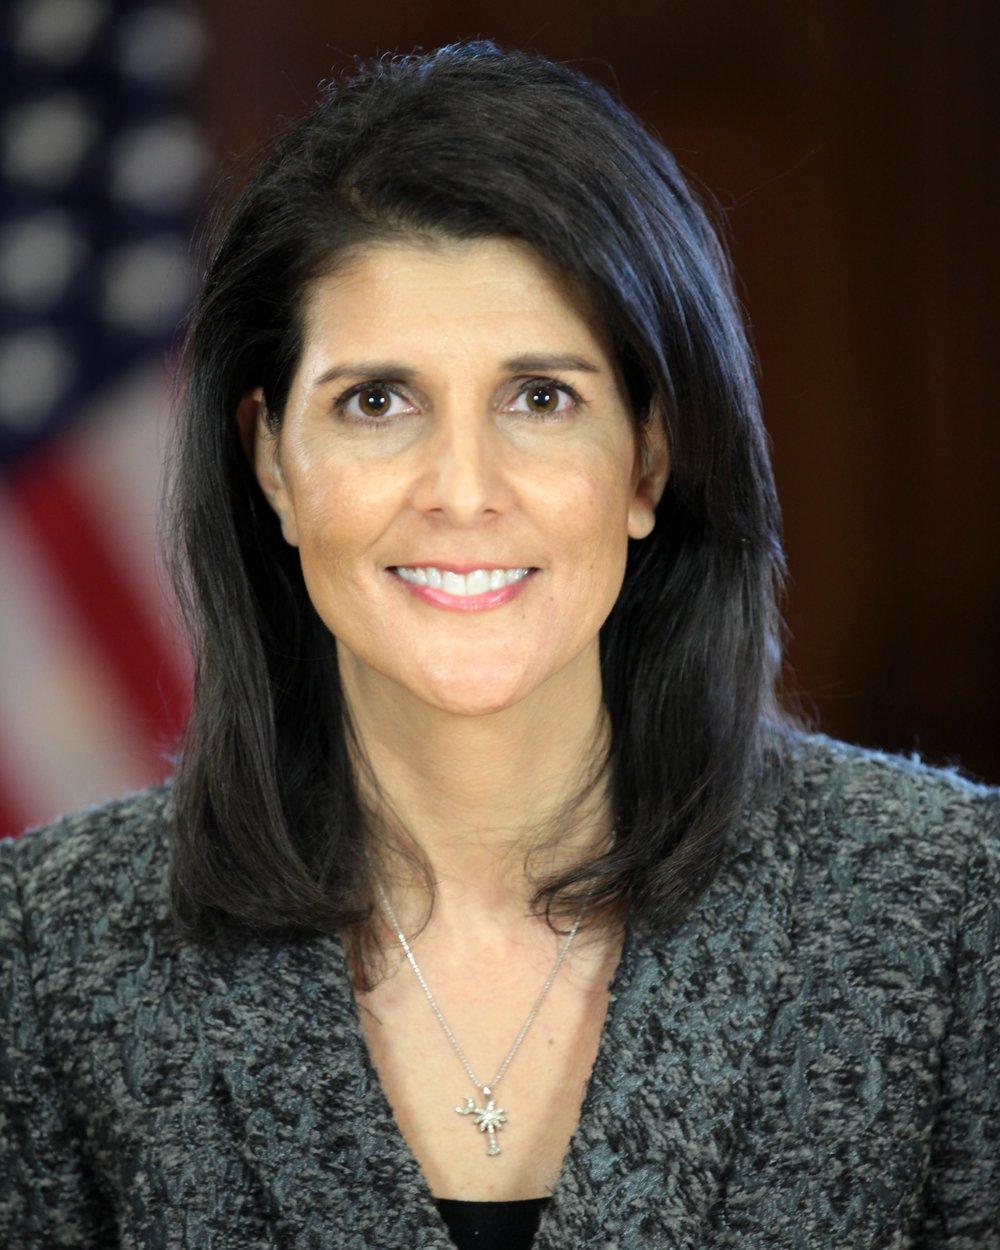 U.S. Ambassador to the U.N. Nikki Haley. Credit: Wikipedia Commons.